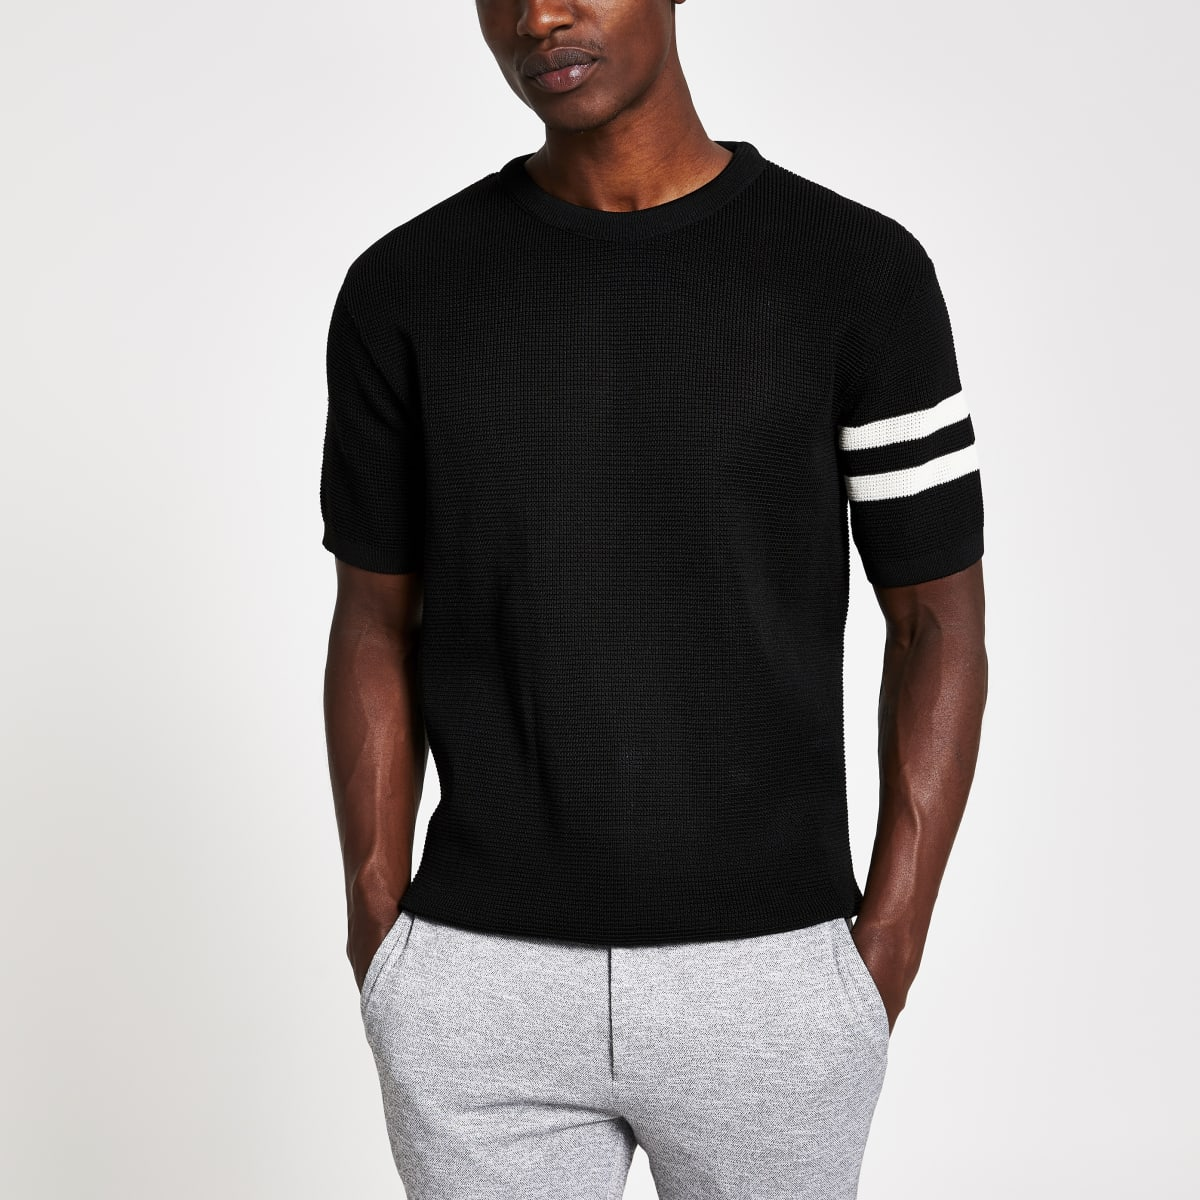 Black waffle slim fit short sleeve T-shirt